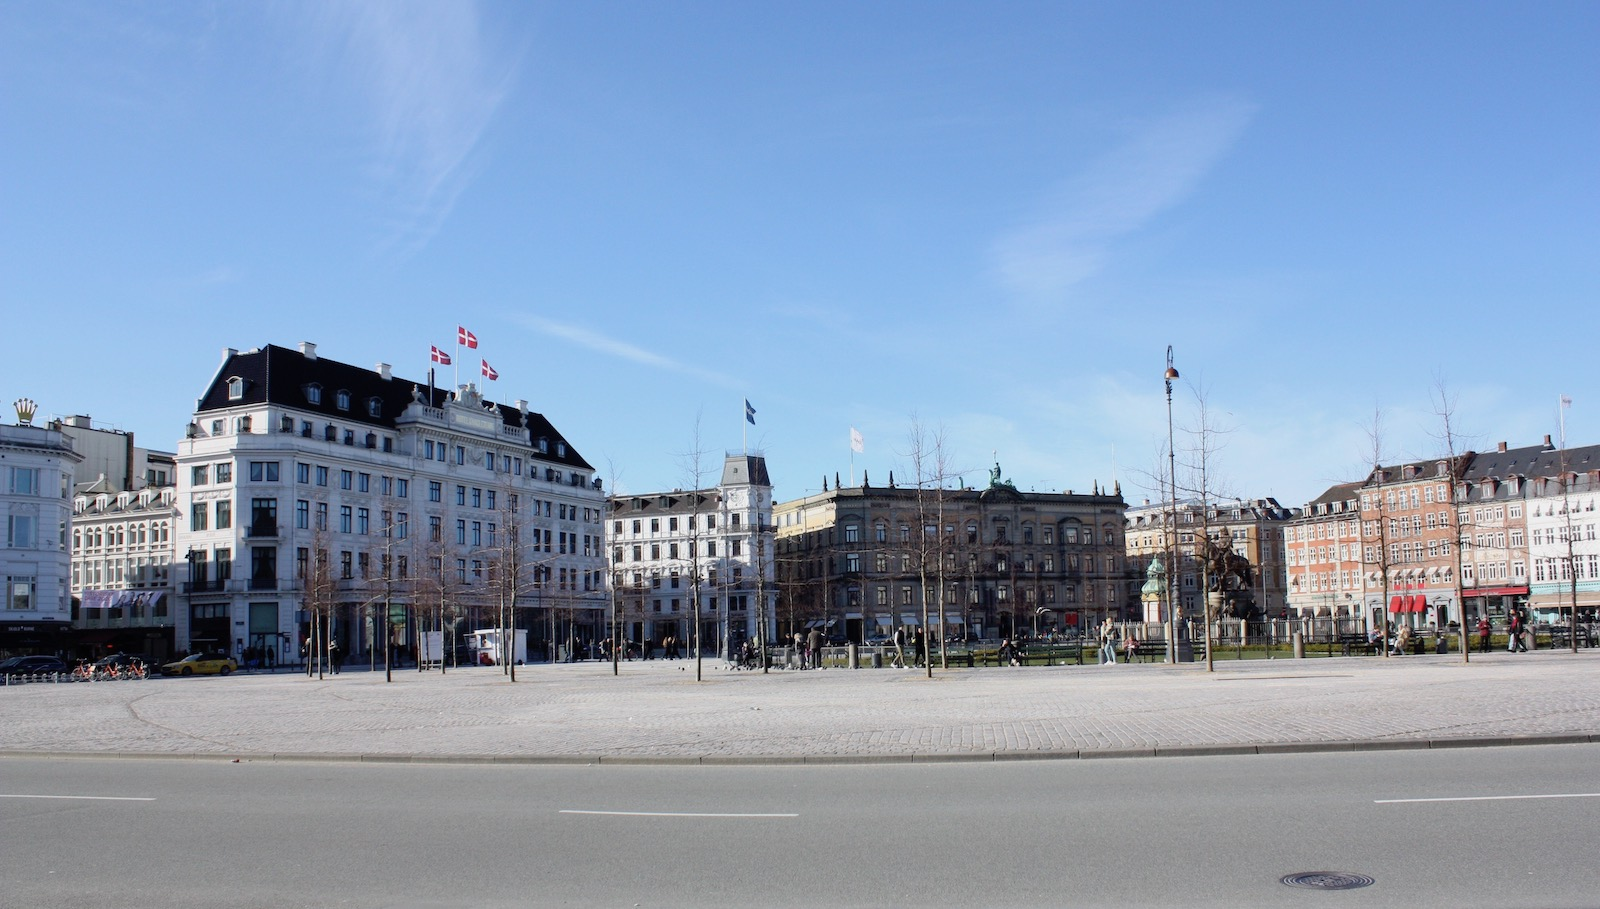 Kongens Nytorv Copenhagen 14.03.20